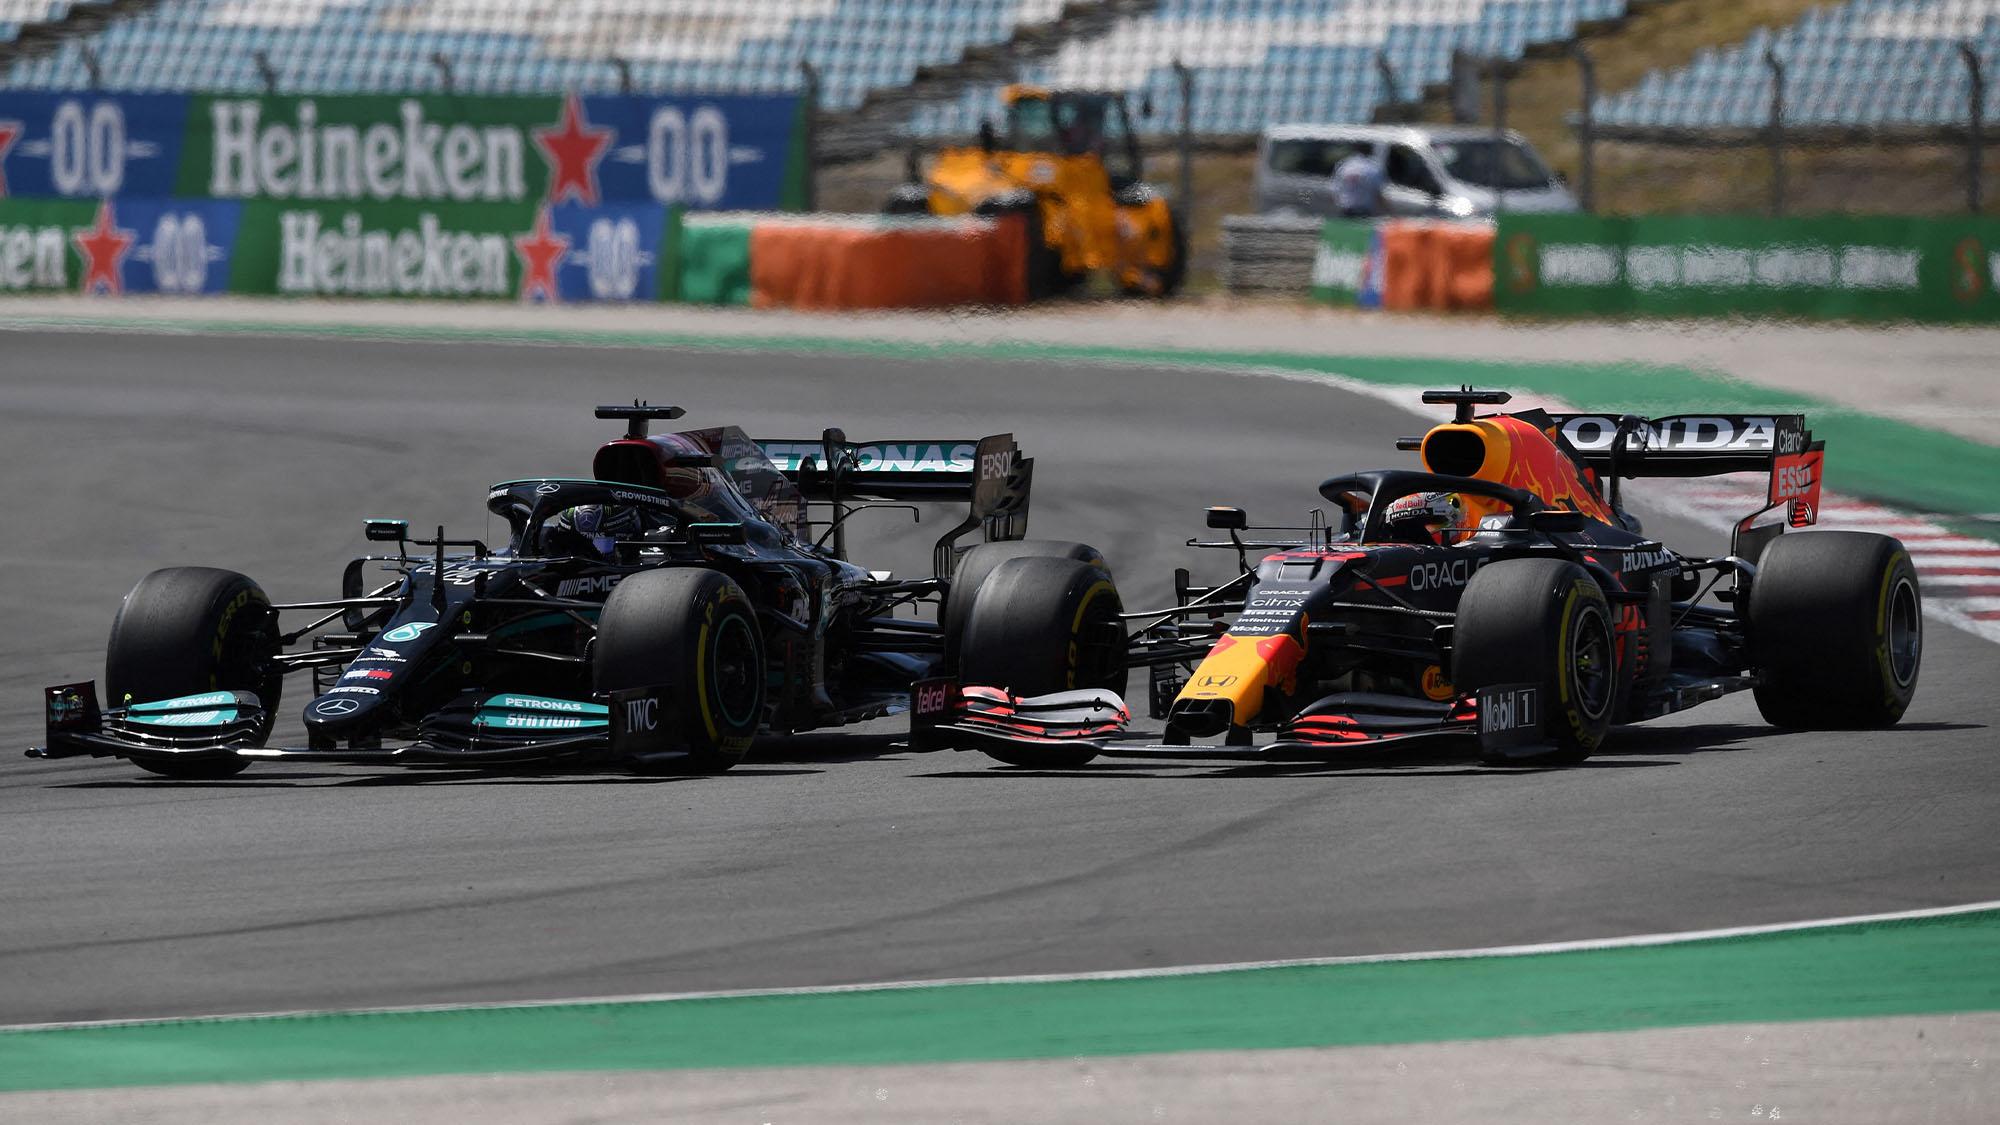 Hamilton Verstappen 2